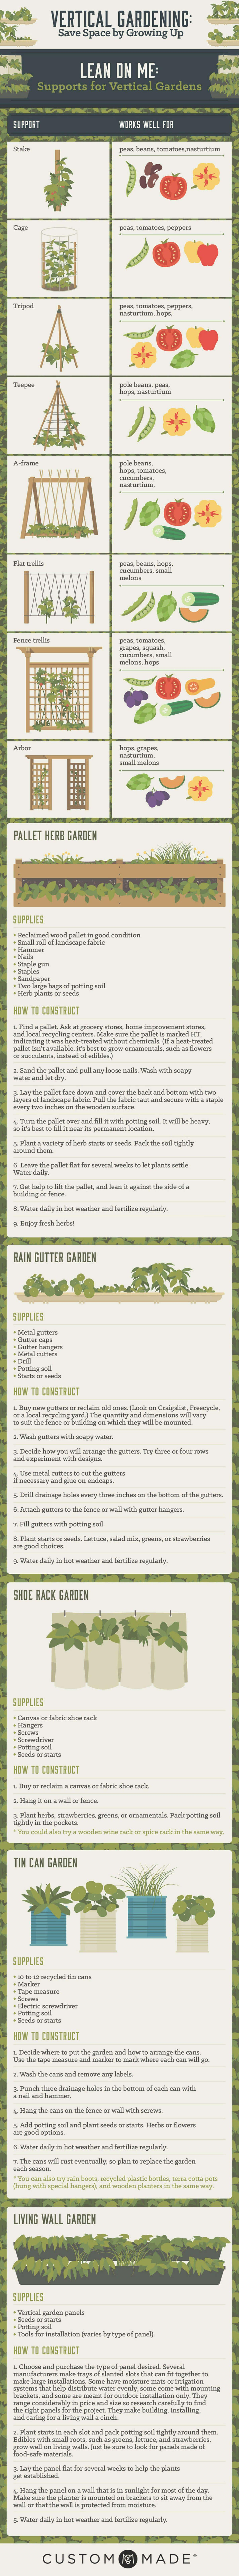 Vertical Gardening: An Infographic | Gardens, Plants and Garden ideas